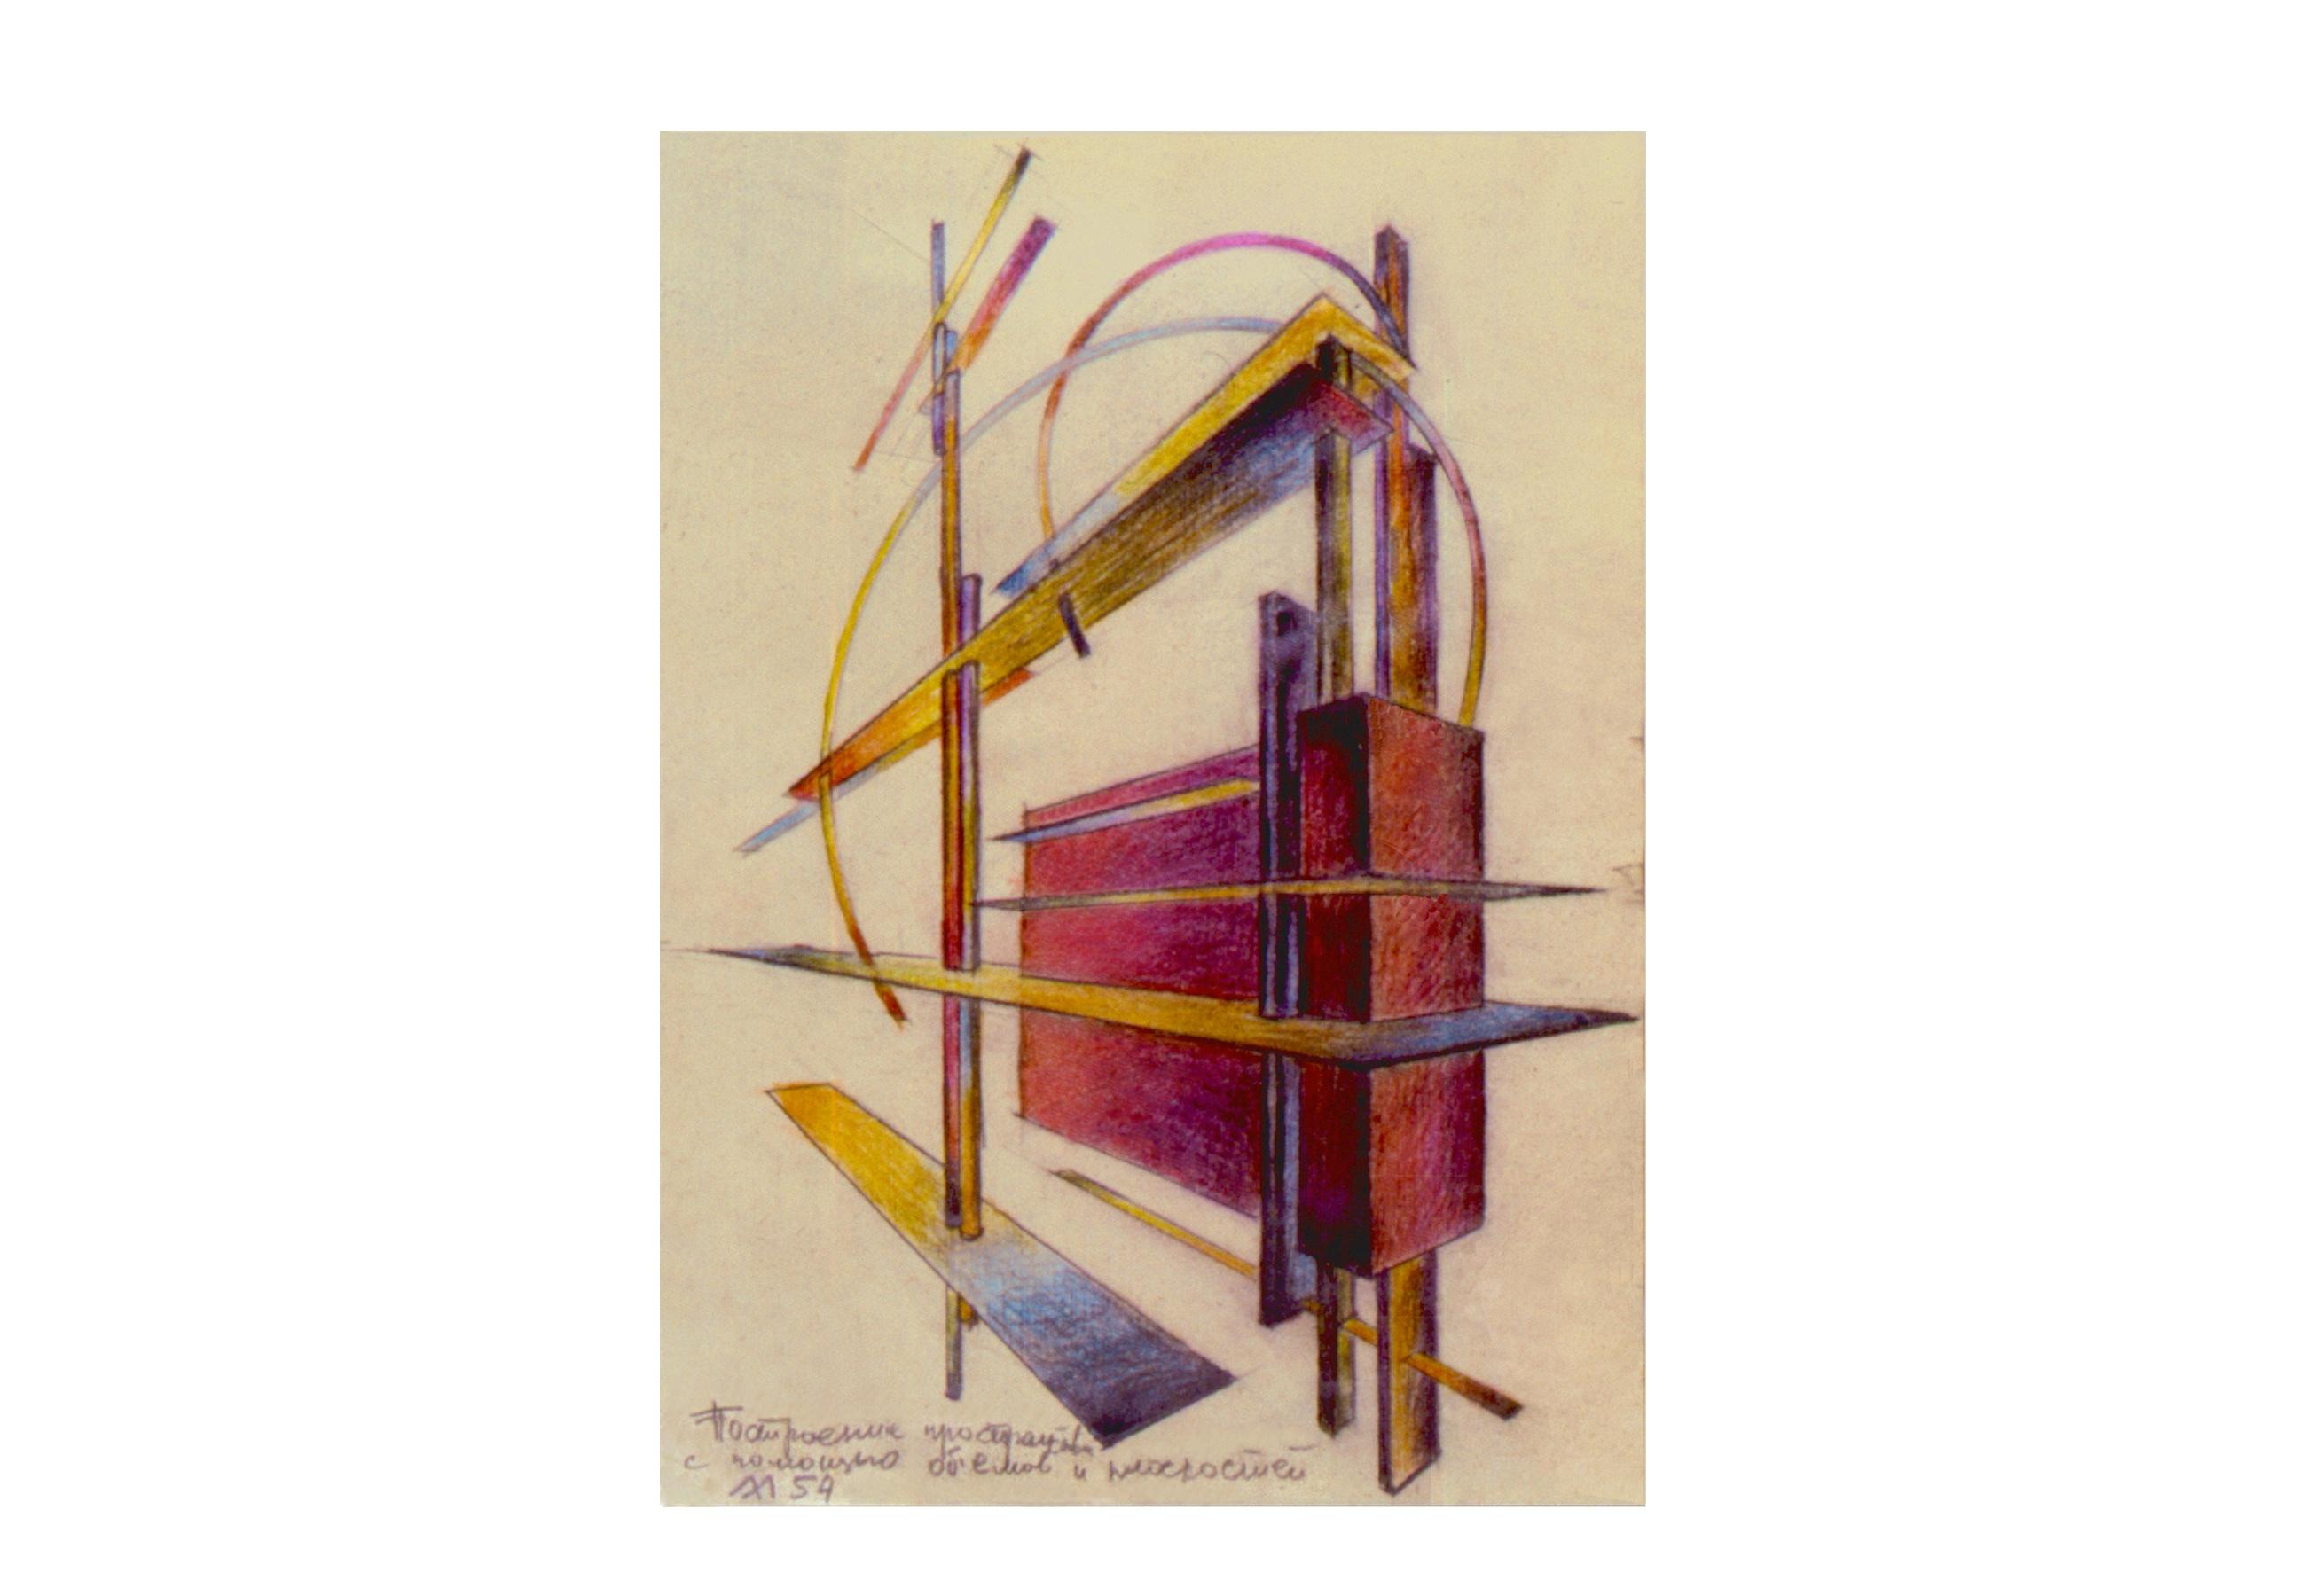 Lamm-Portfolio-1954-1955-16.jpg